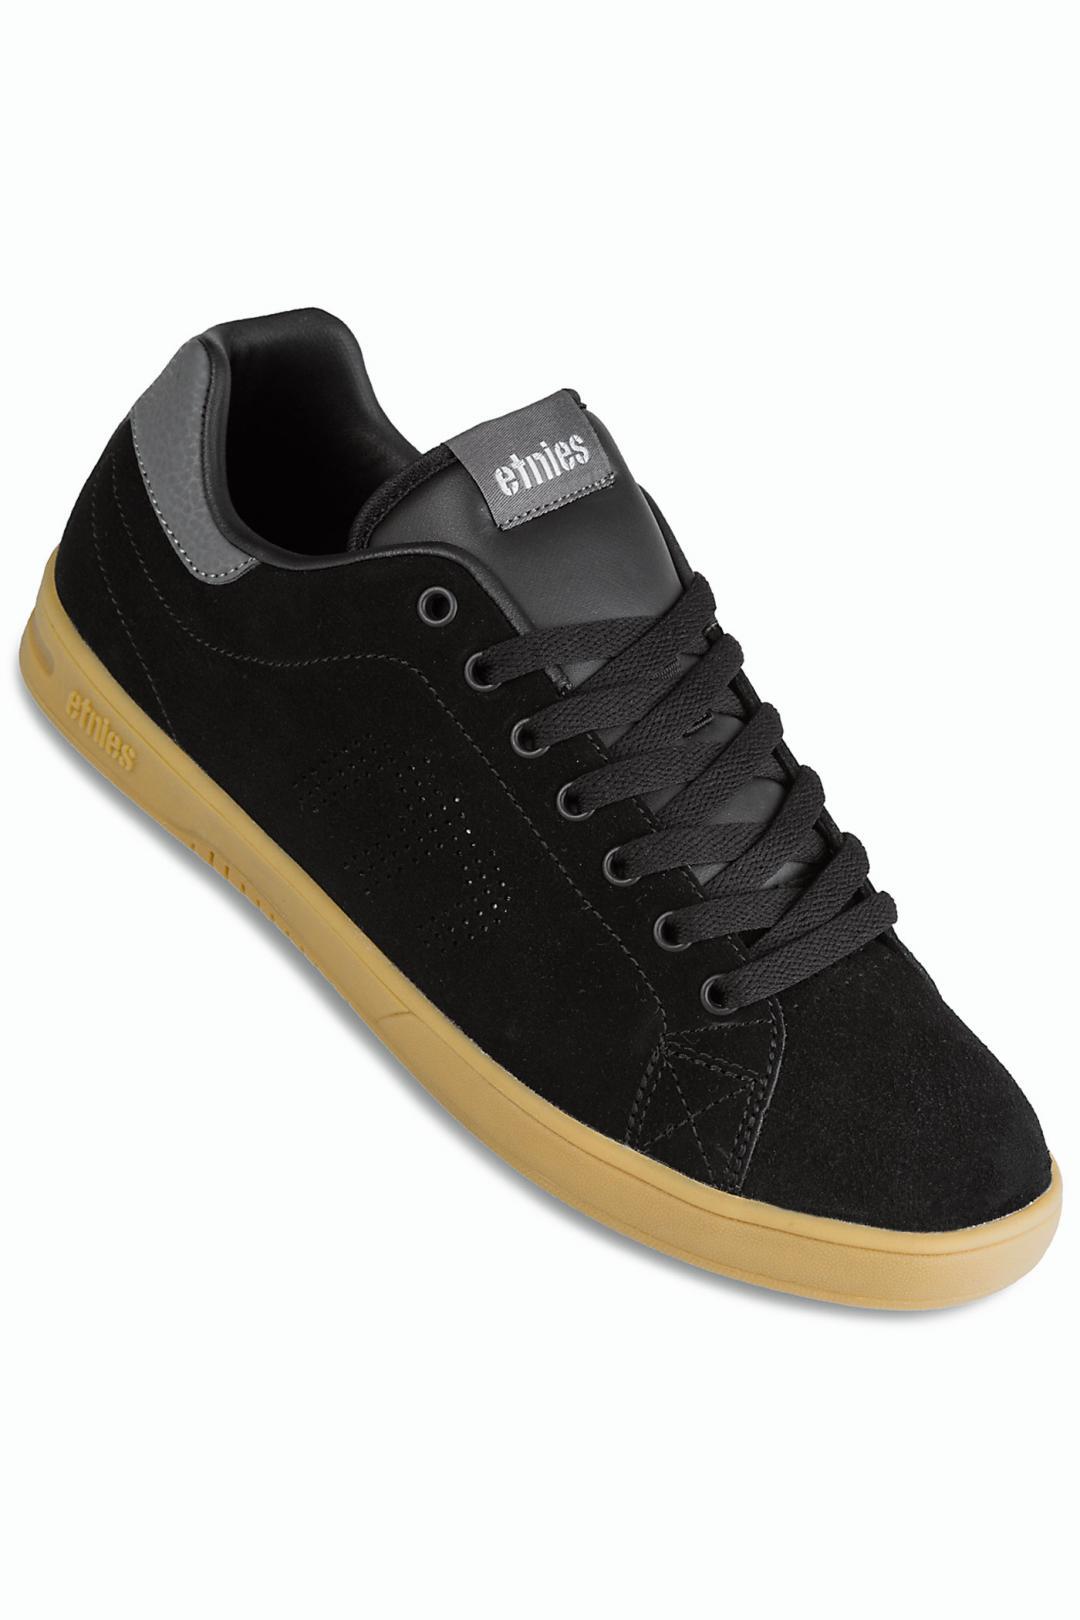 Uomo Etnies Callicut LS black grey gum | Sneaker